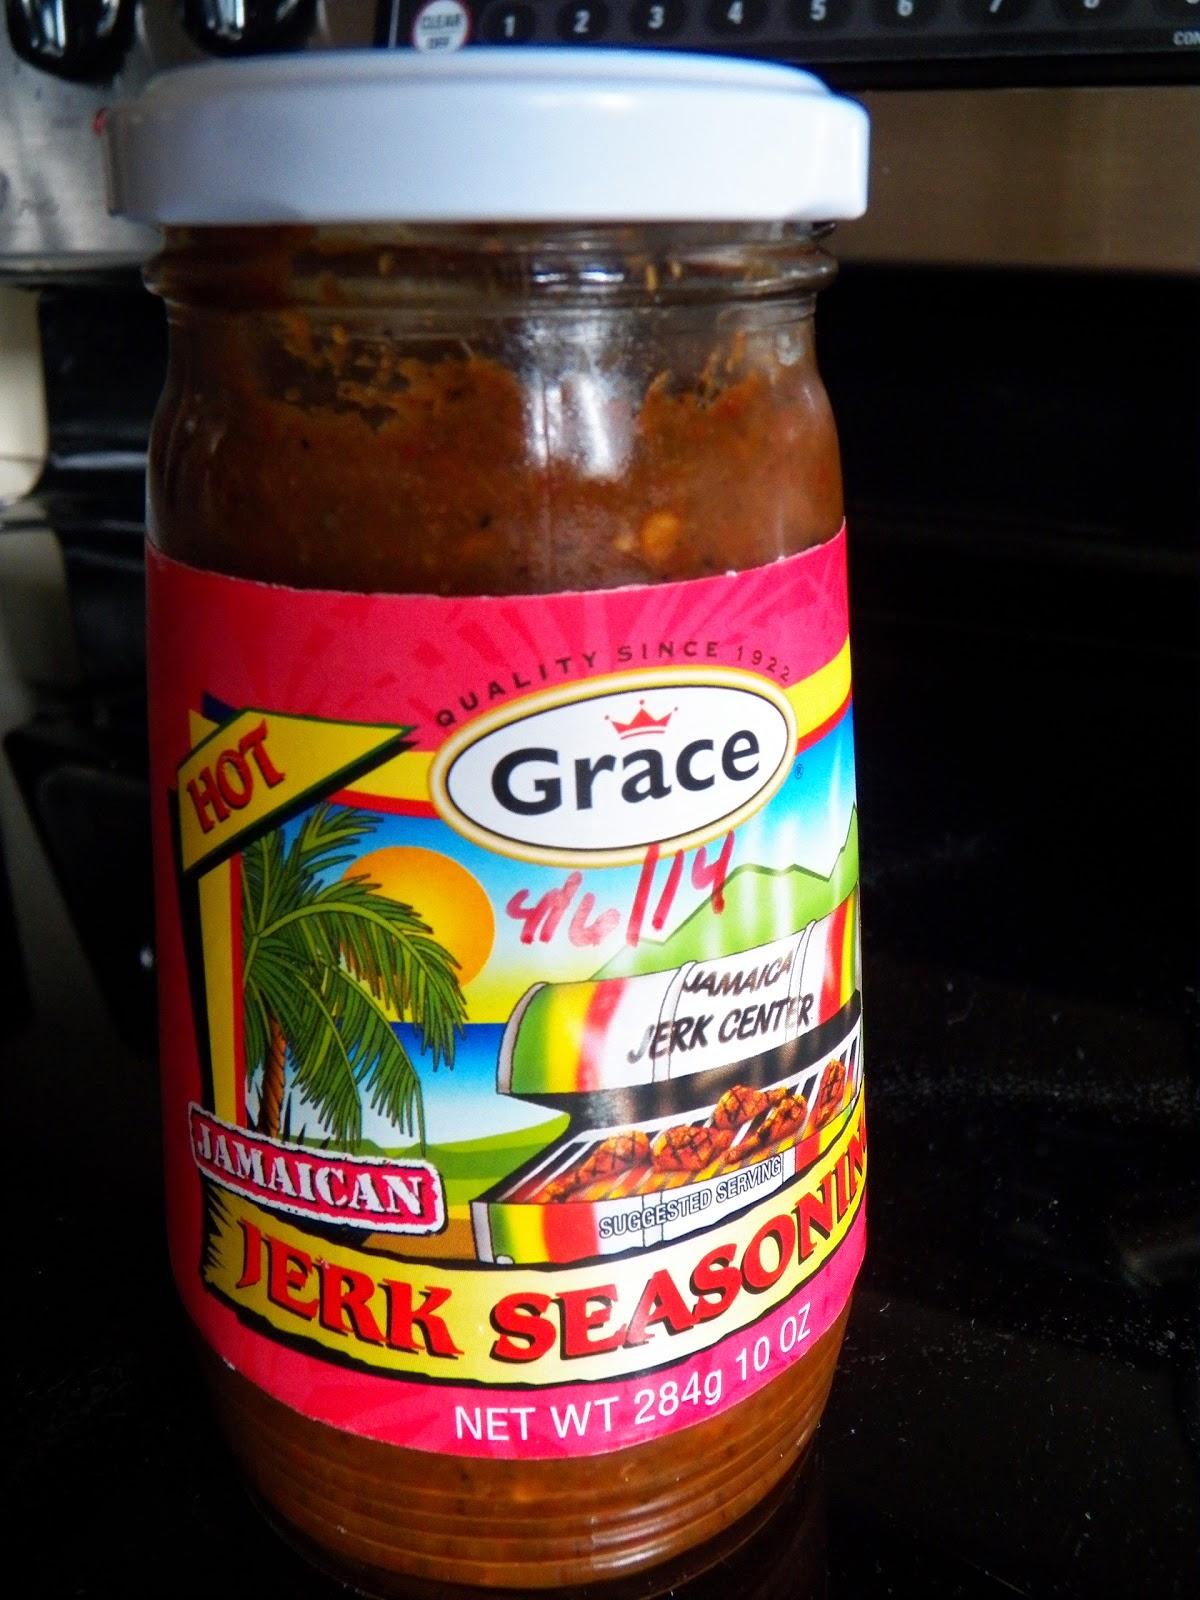 a glass jar of Jamaican jerk seasoning